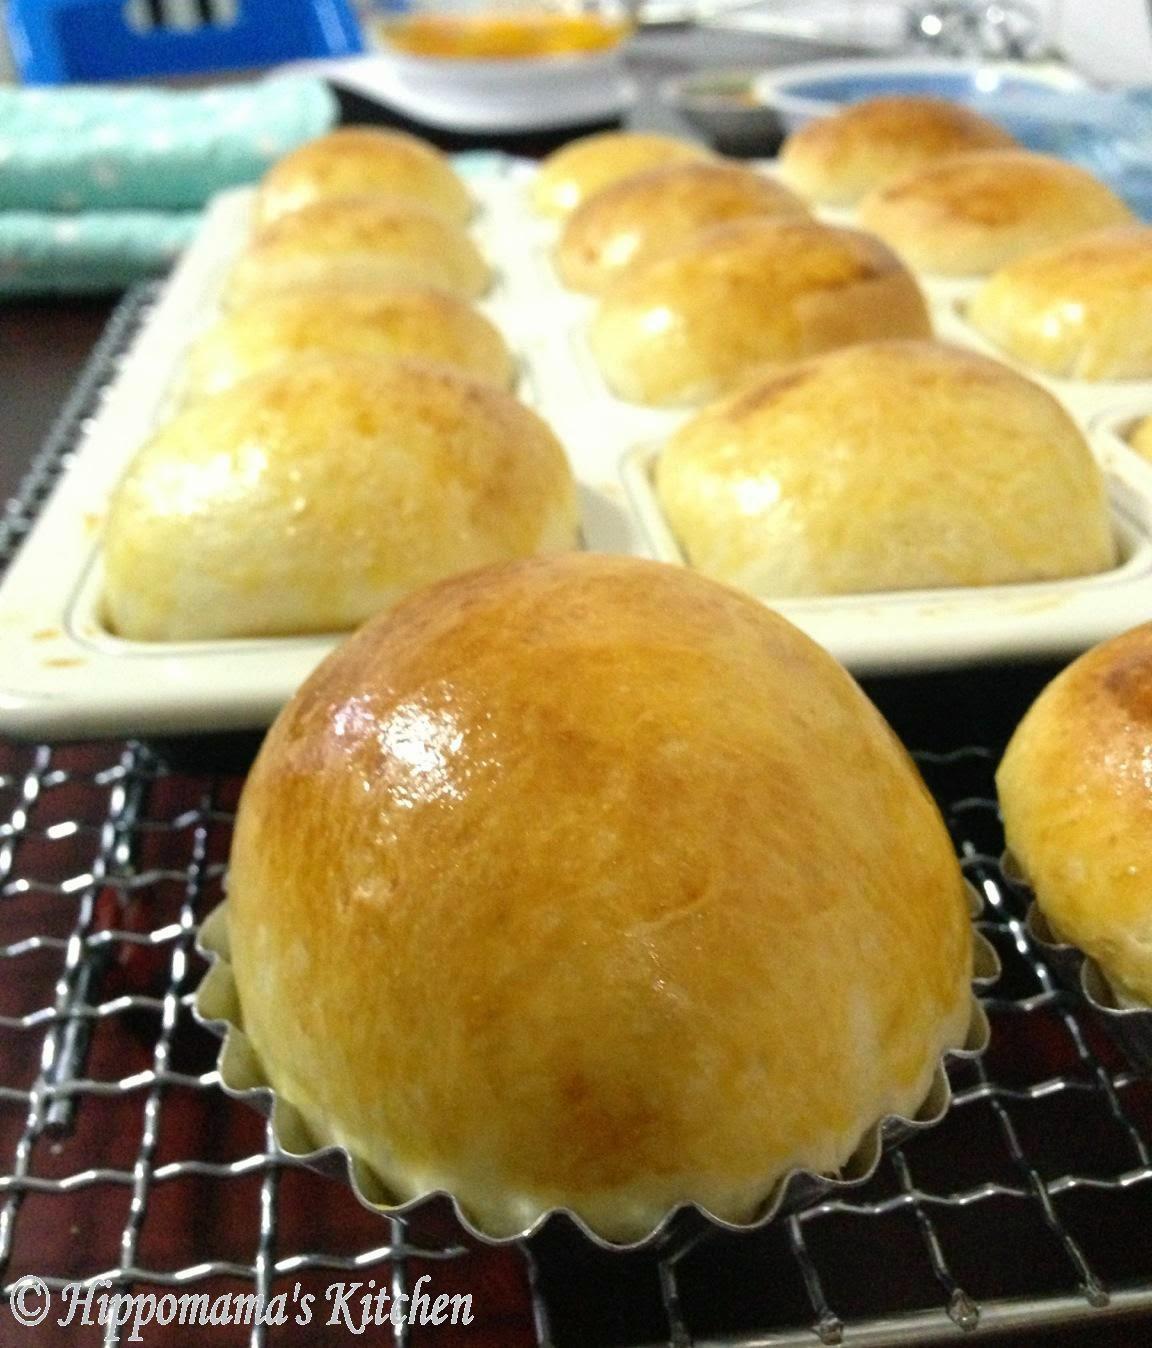 ... Kitchen 怡。然自得: Bread-Straight Dough #2 面包-直接法#2